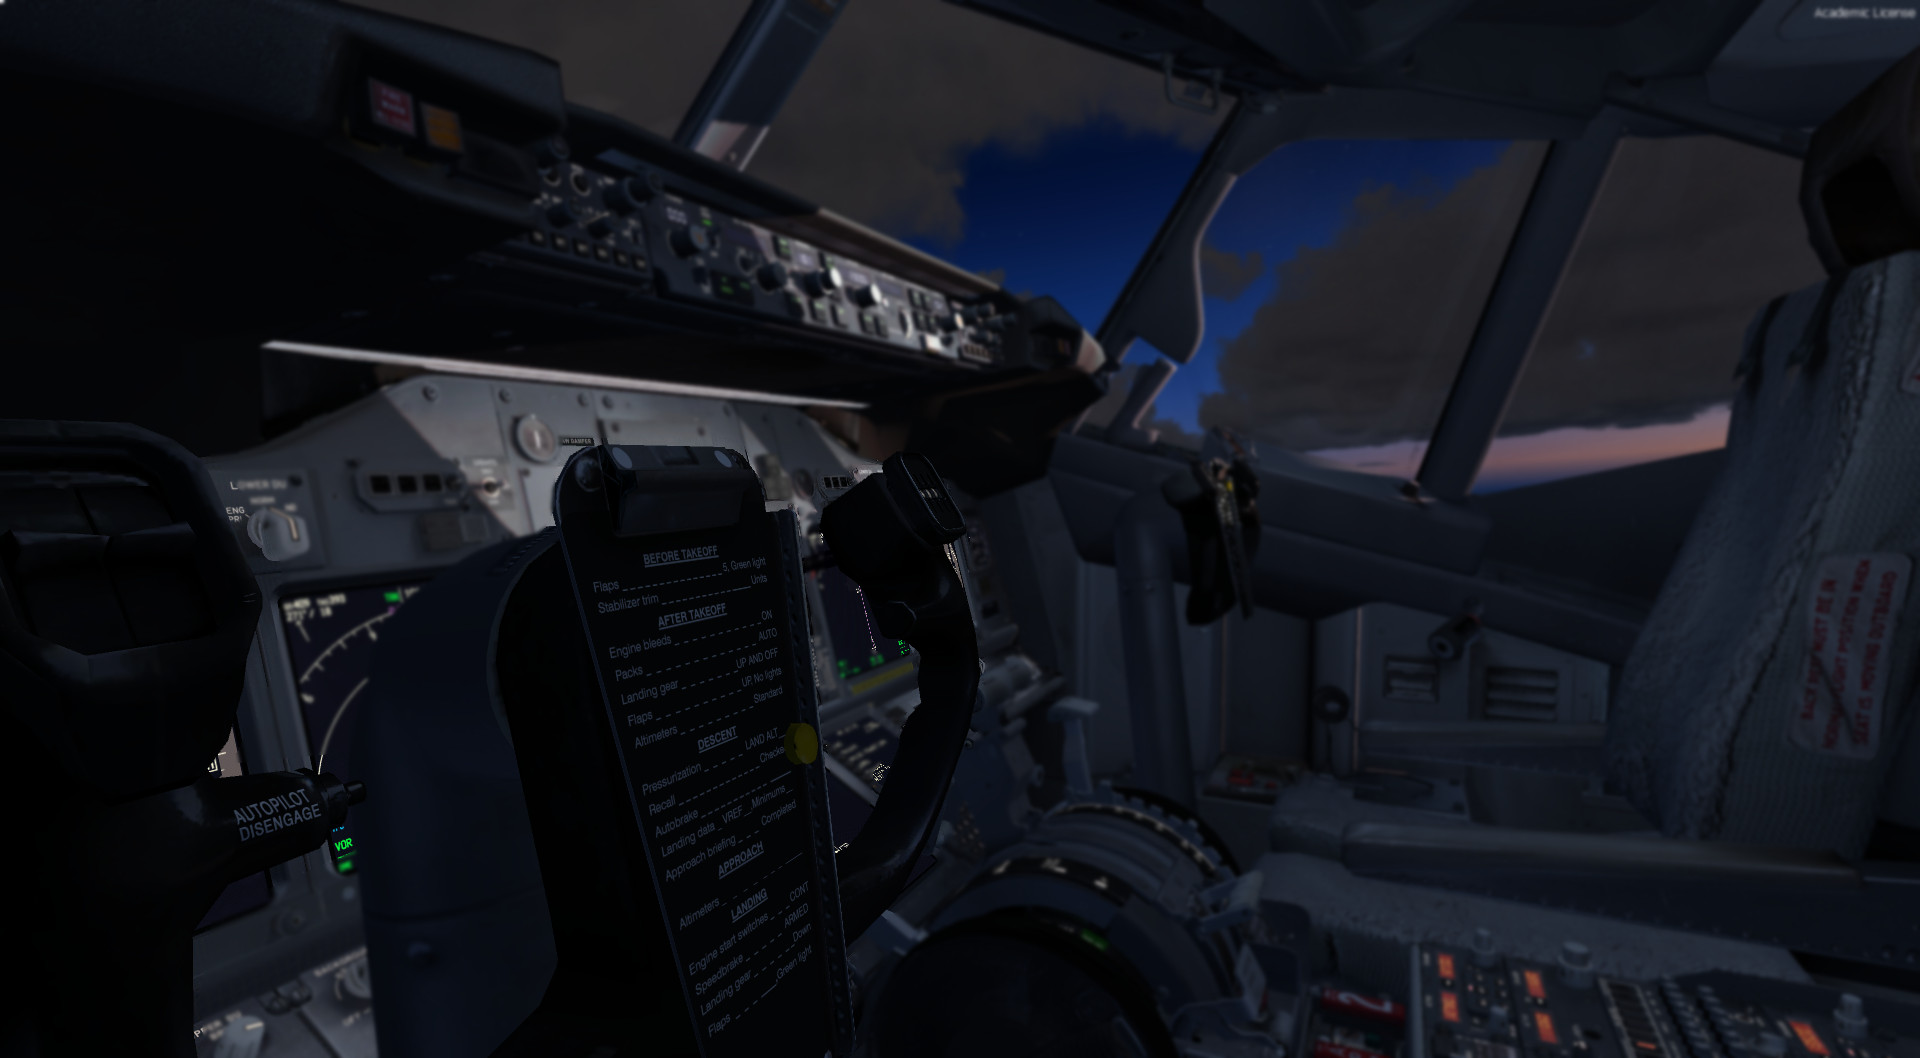 p3d] Flight Sim Edited Shots - Screenshots and Images